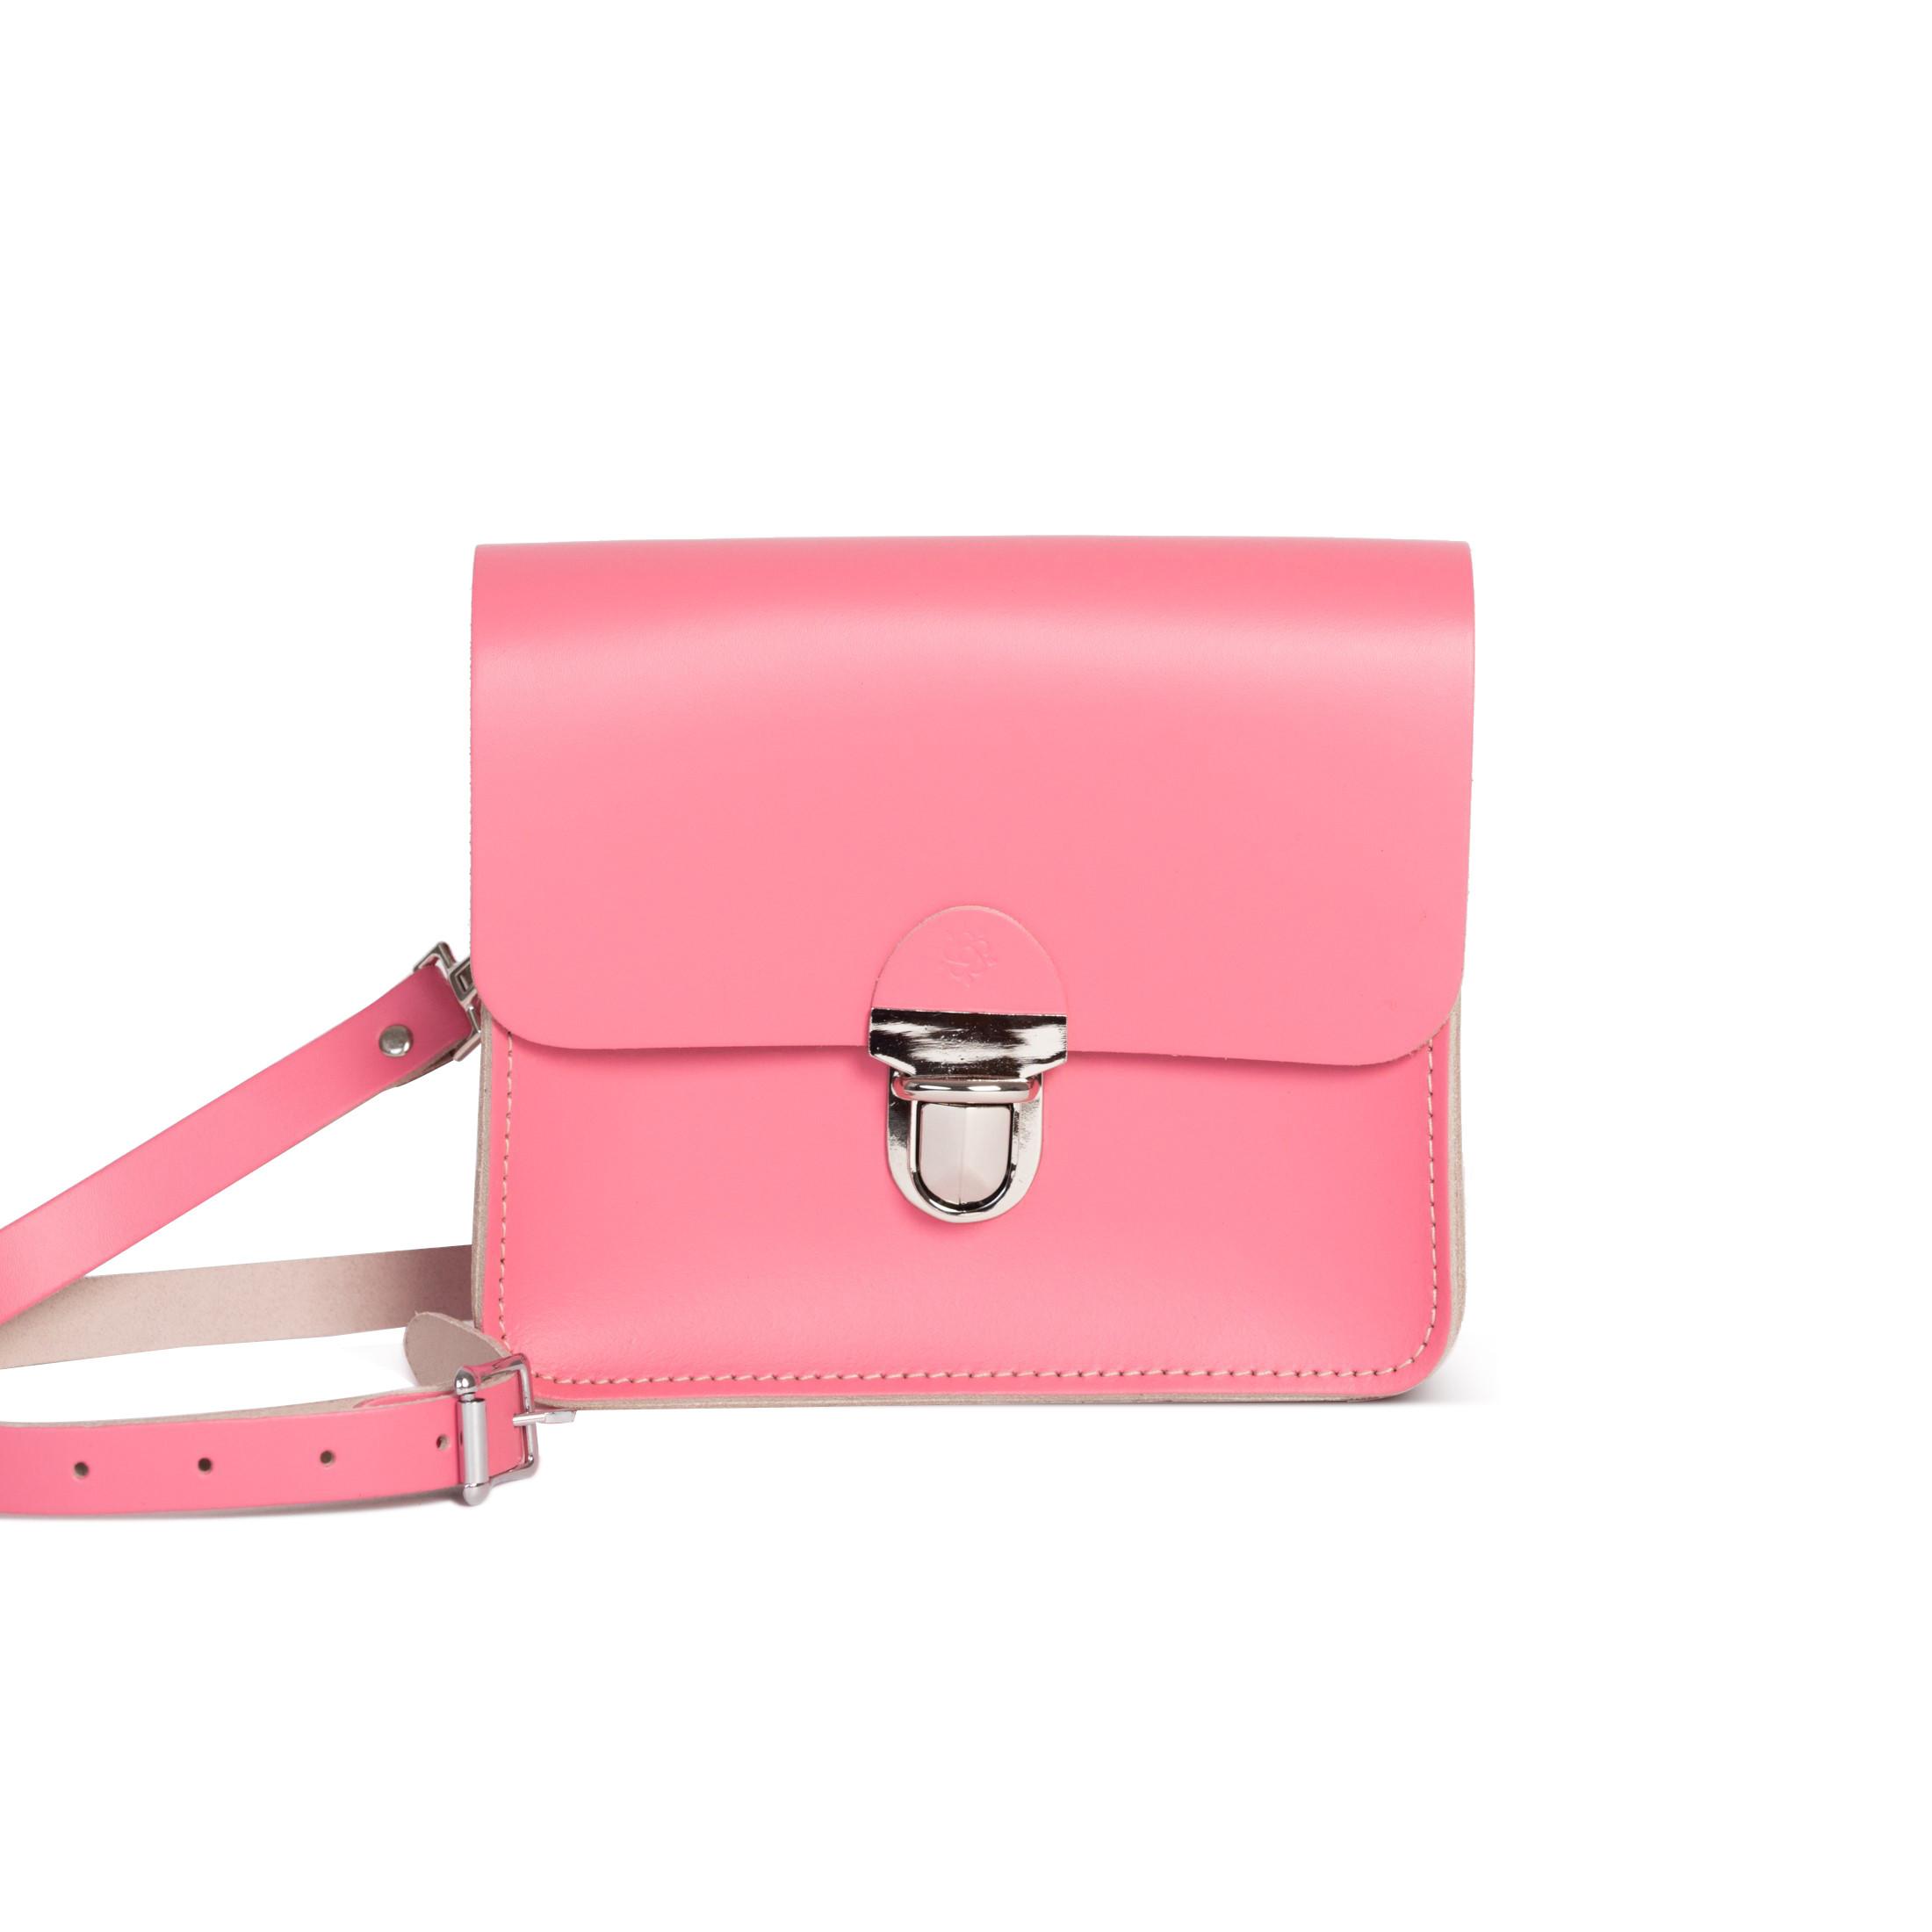 Sofia Premium Leather Crossbody Bag in Pastel Pink